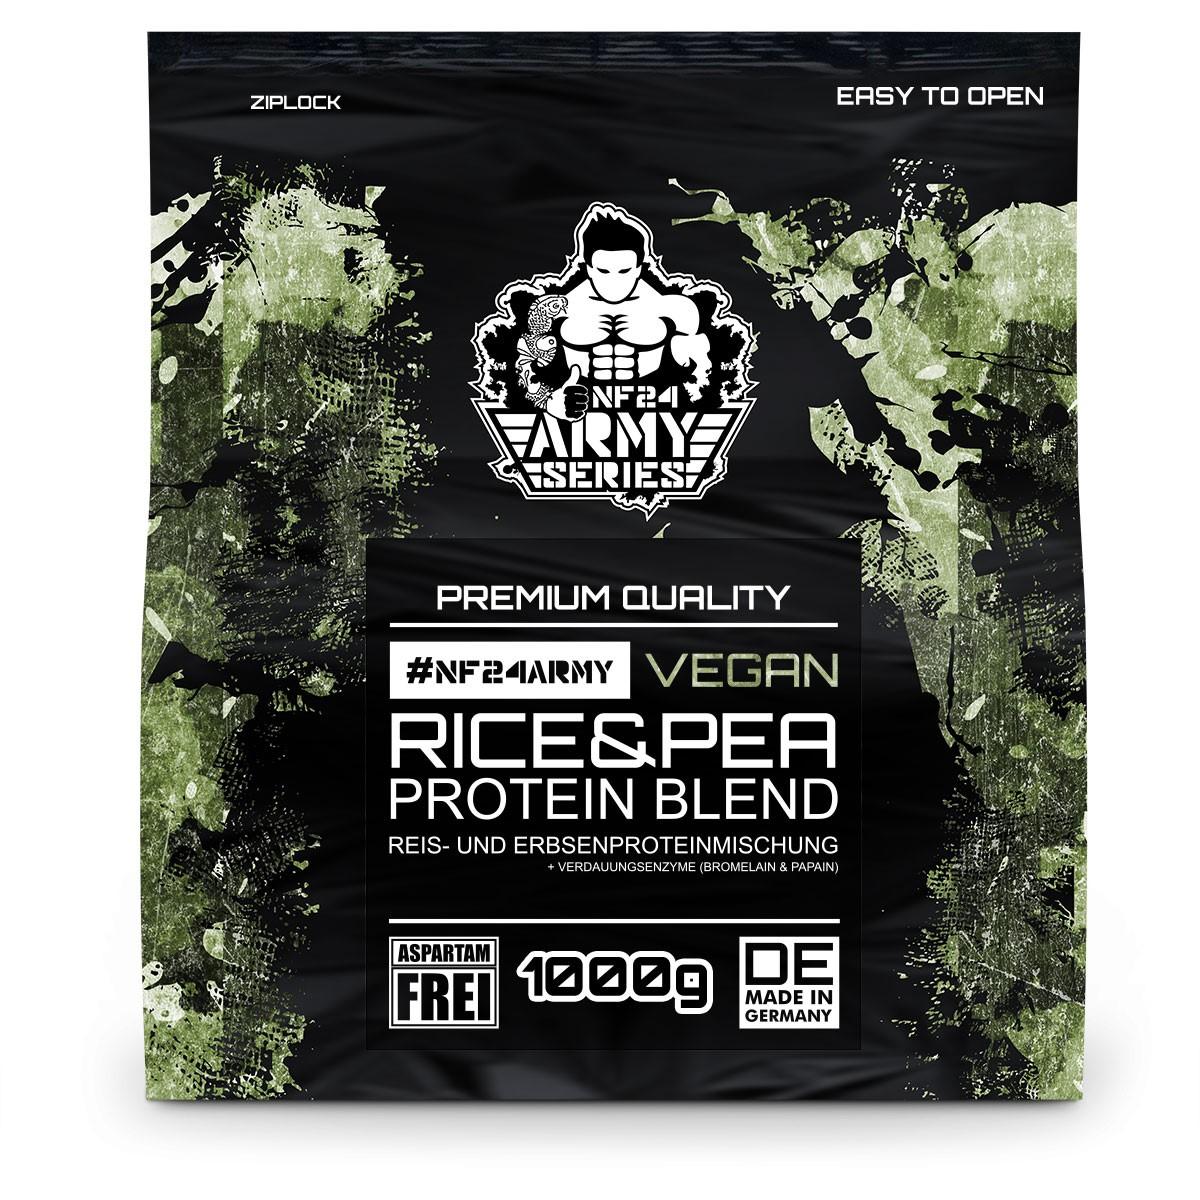 Veganes Proteinpulver Erbsen-Reisproteinmischung